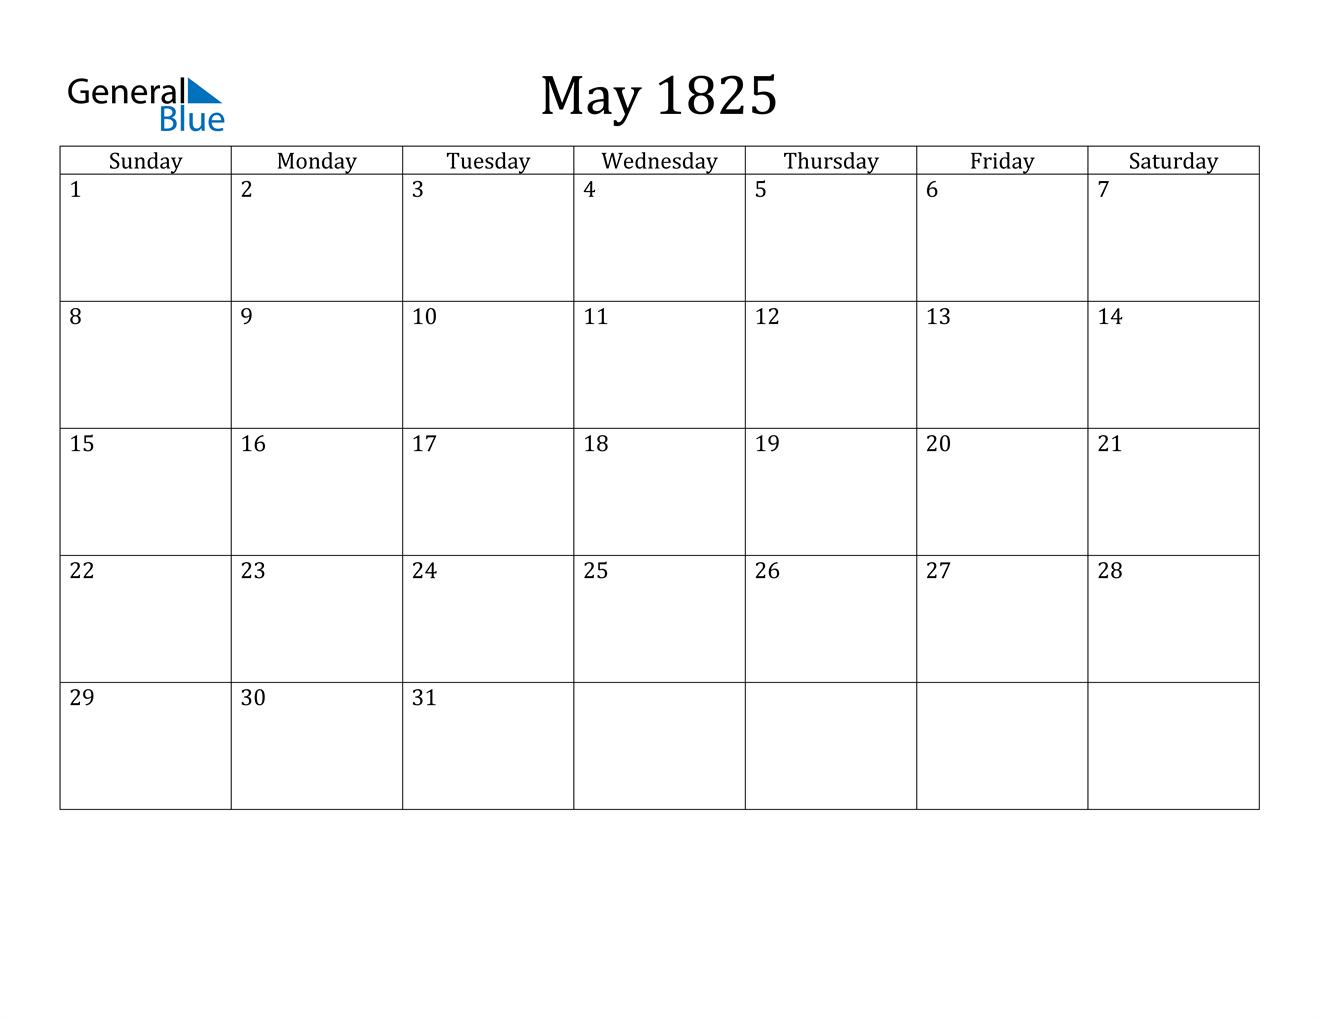 Image of May 1825 Calendar